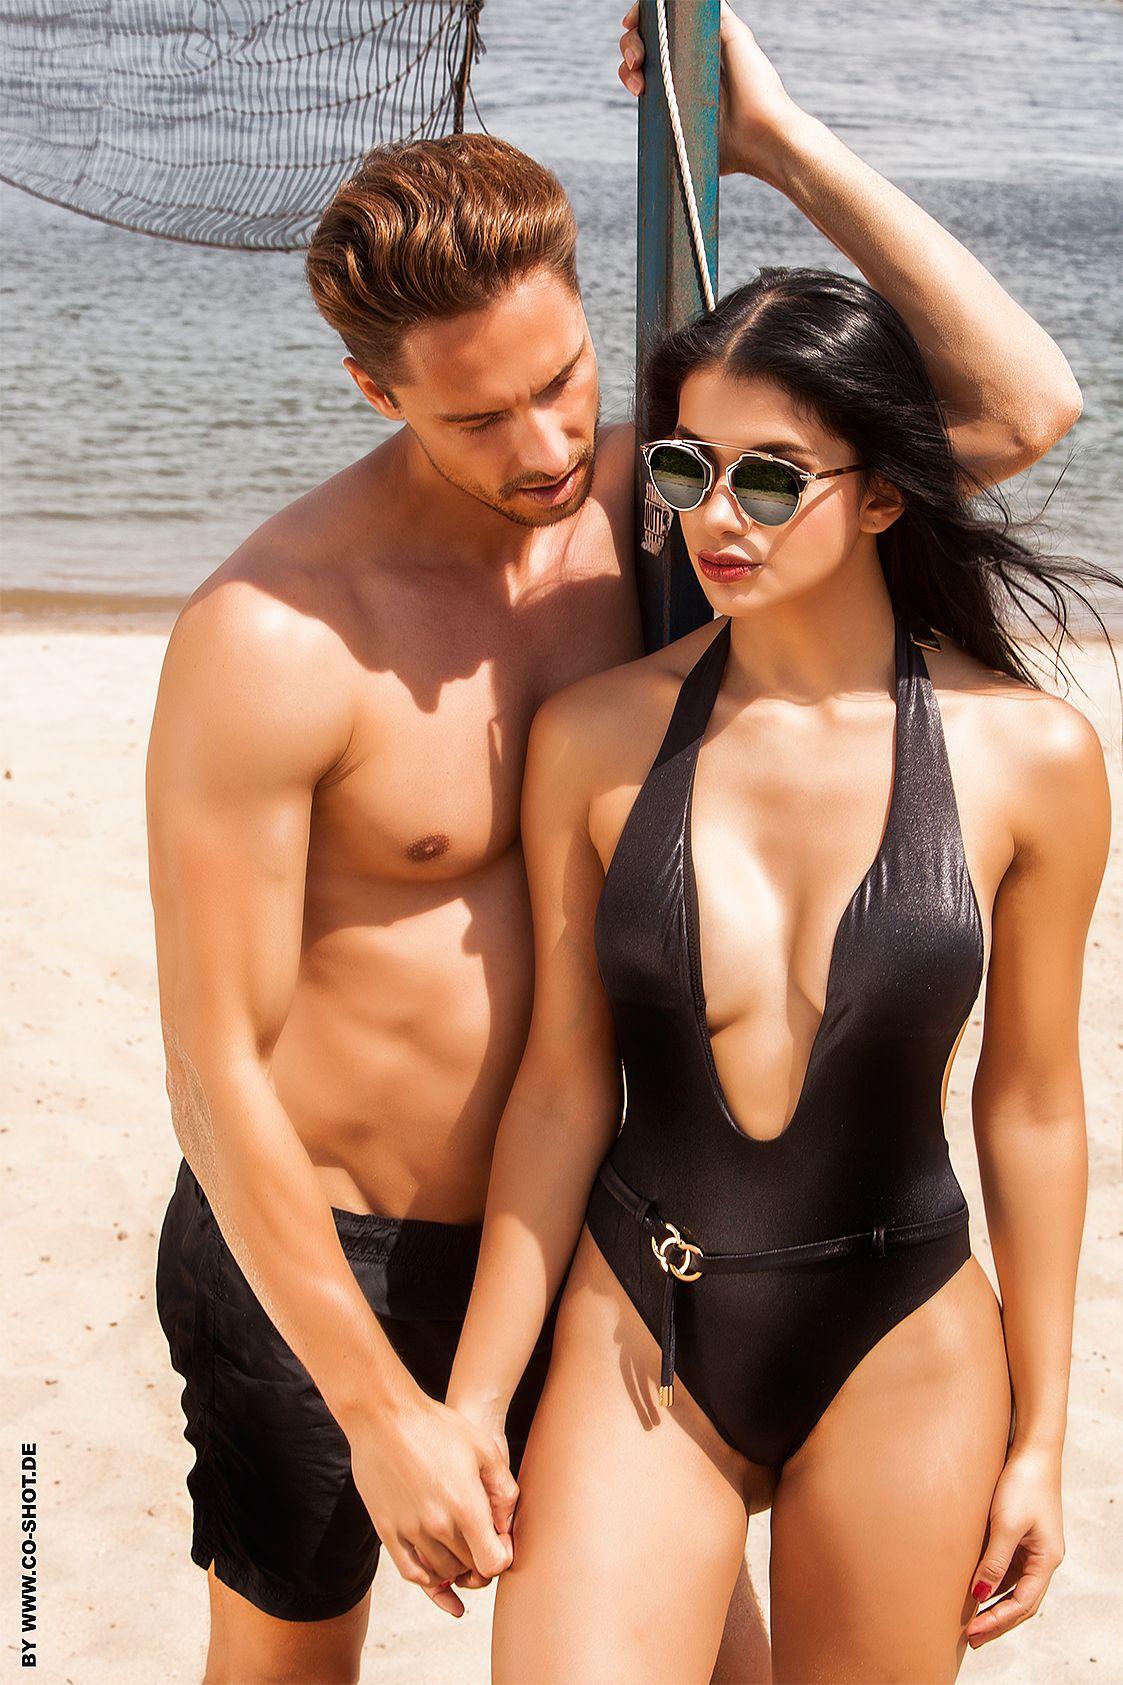 Pin Sagt Man Nicht On Monokini Slingshot Swimwear Pinterest Monokini Badeanzug And Hosen Jpg 1123x1685 One